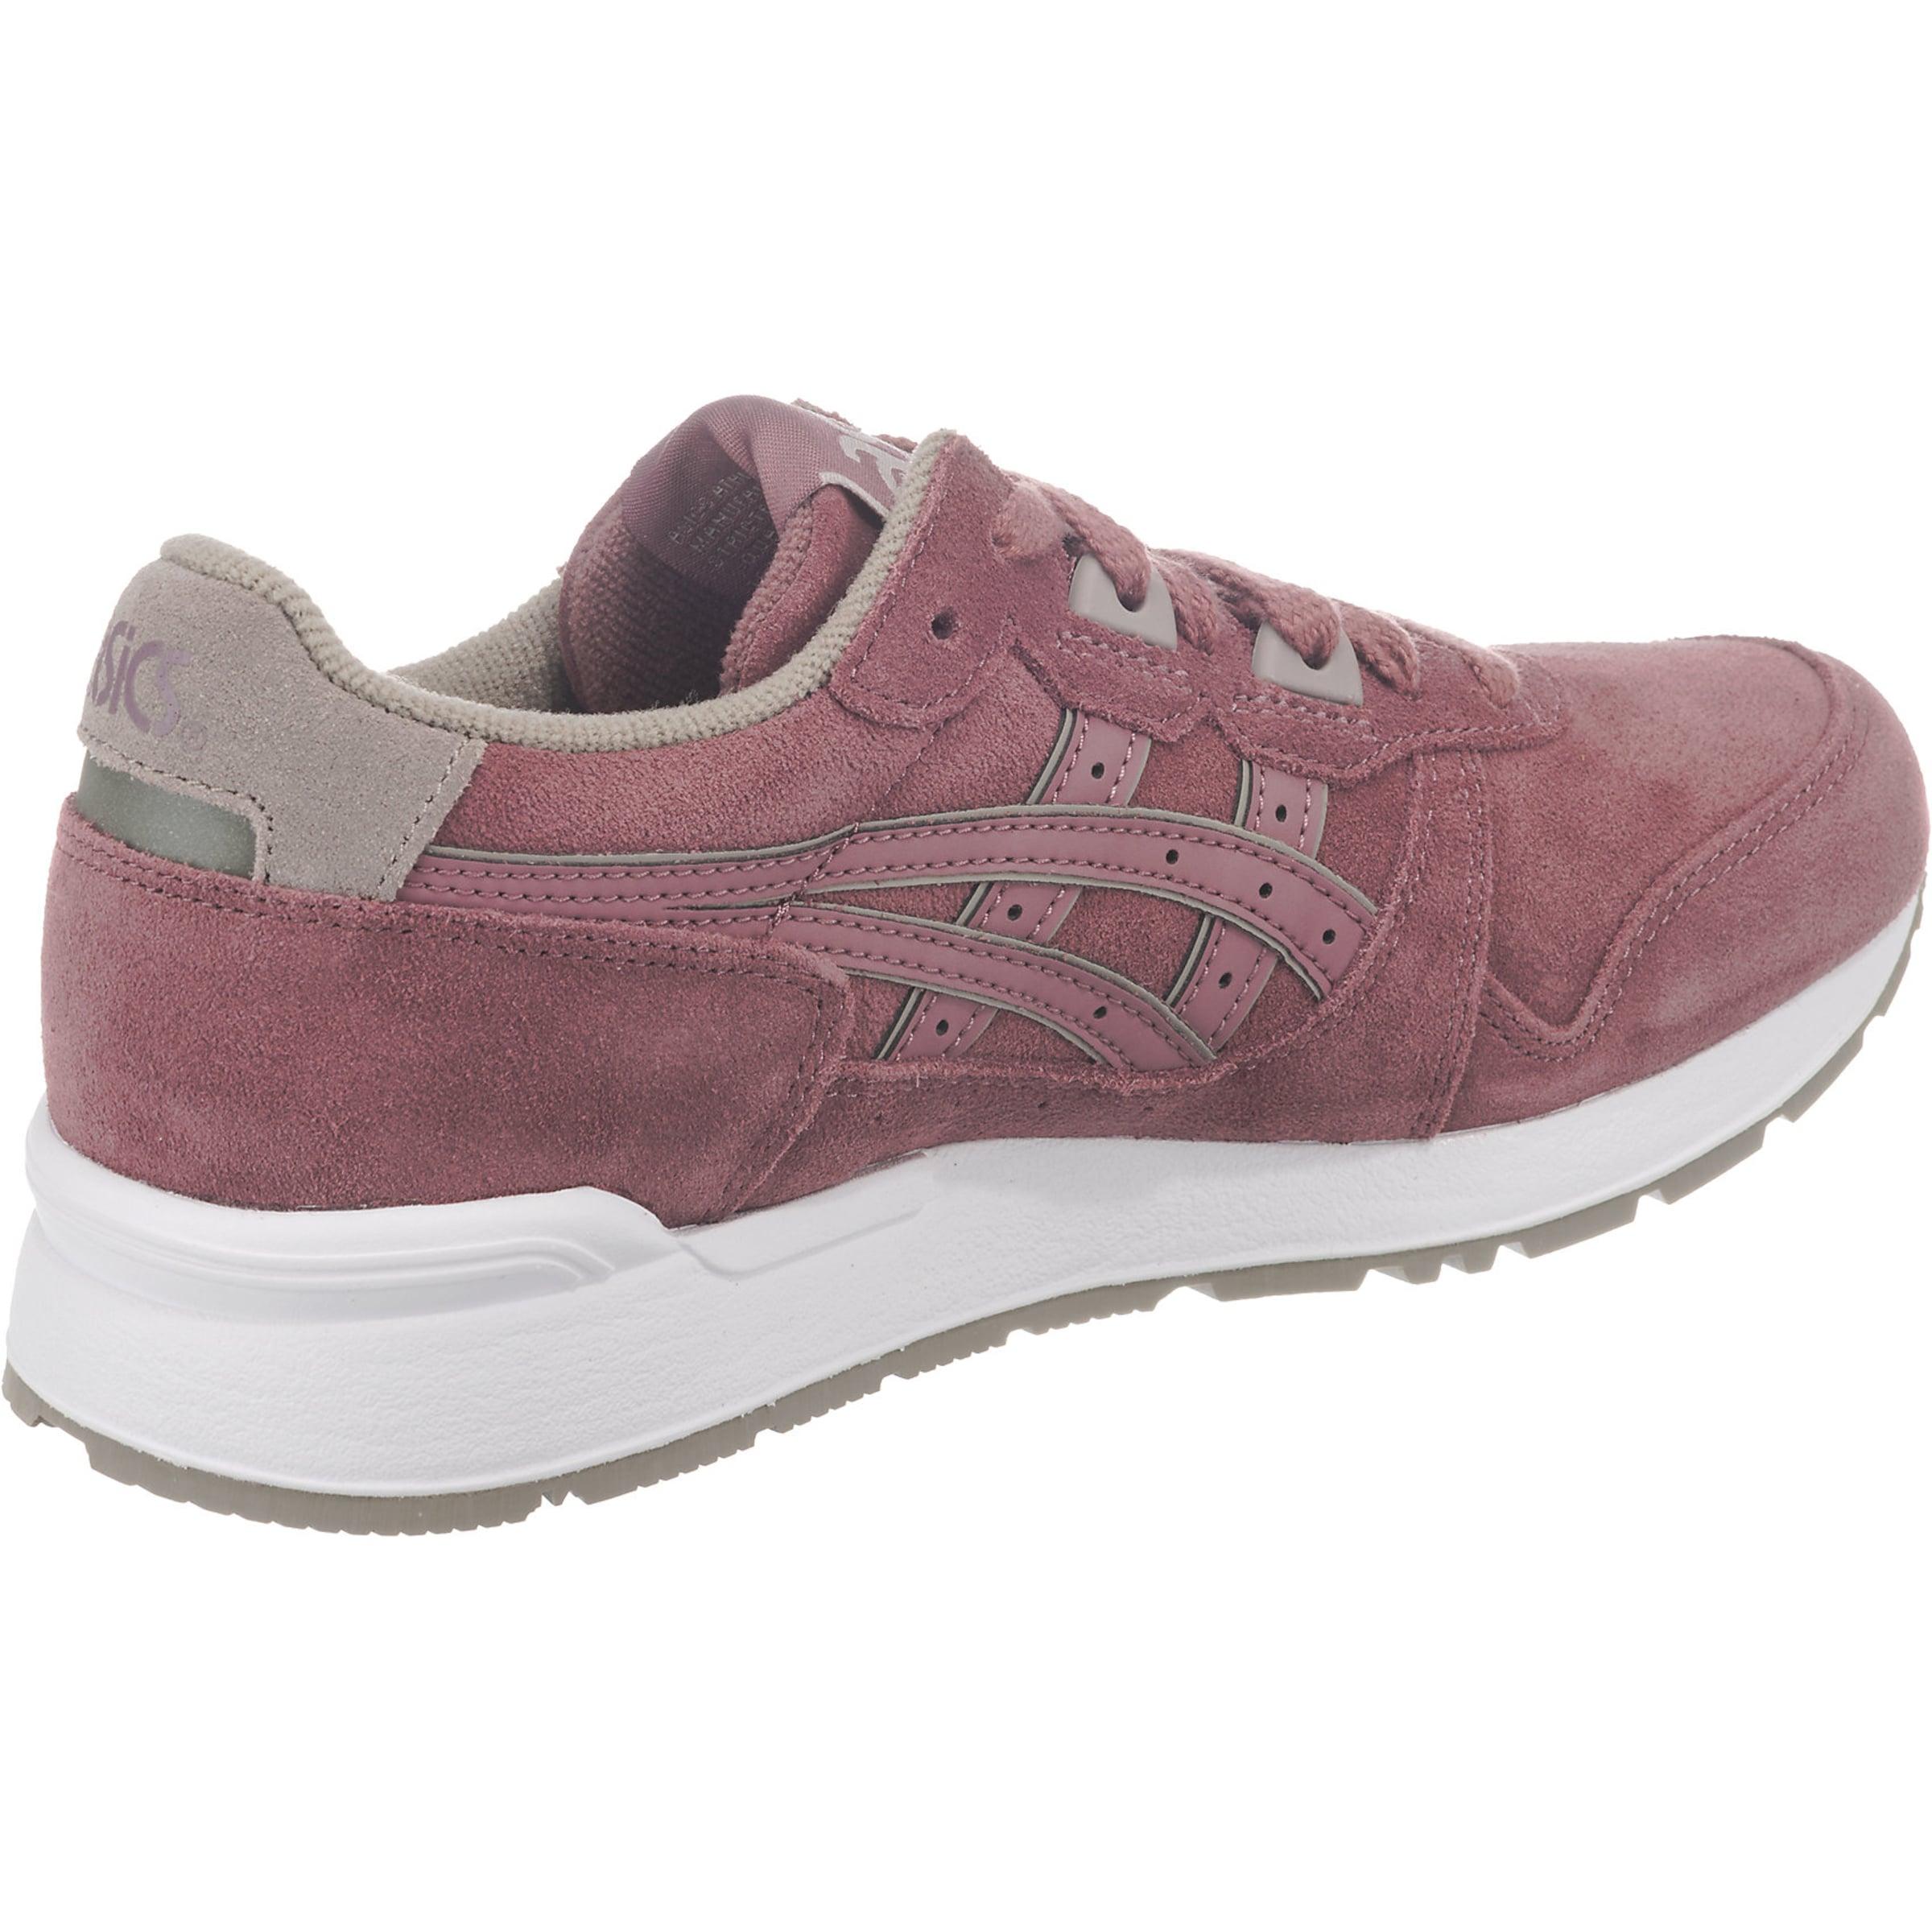 Komfortable Online-Verkauf Asics Tiger GEL-LYTE Sneakers Low Großhandelspreis Online Kaufen Günstig Online pF9BRhOCi